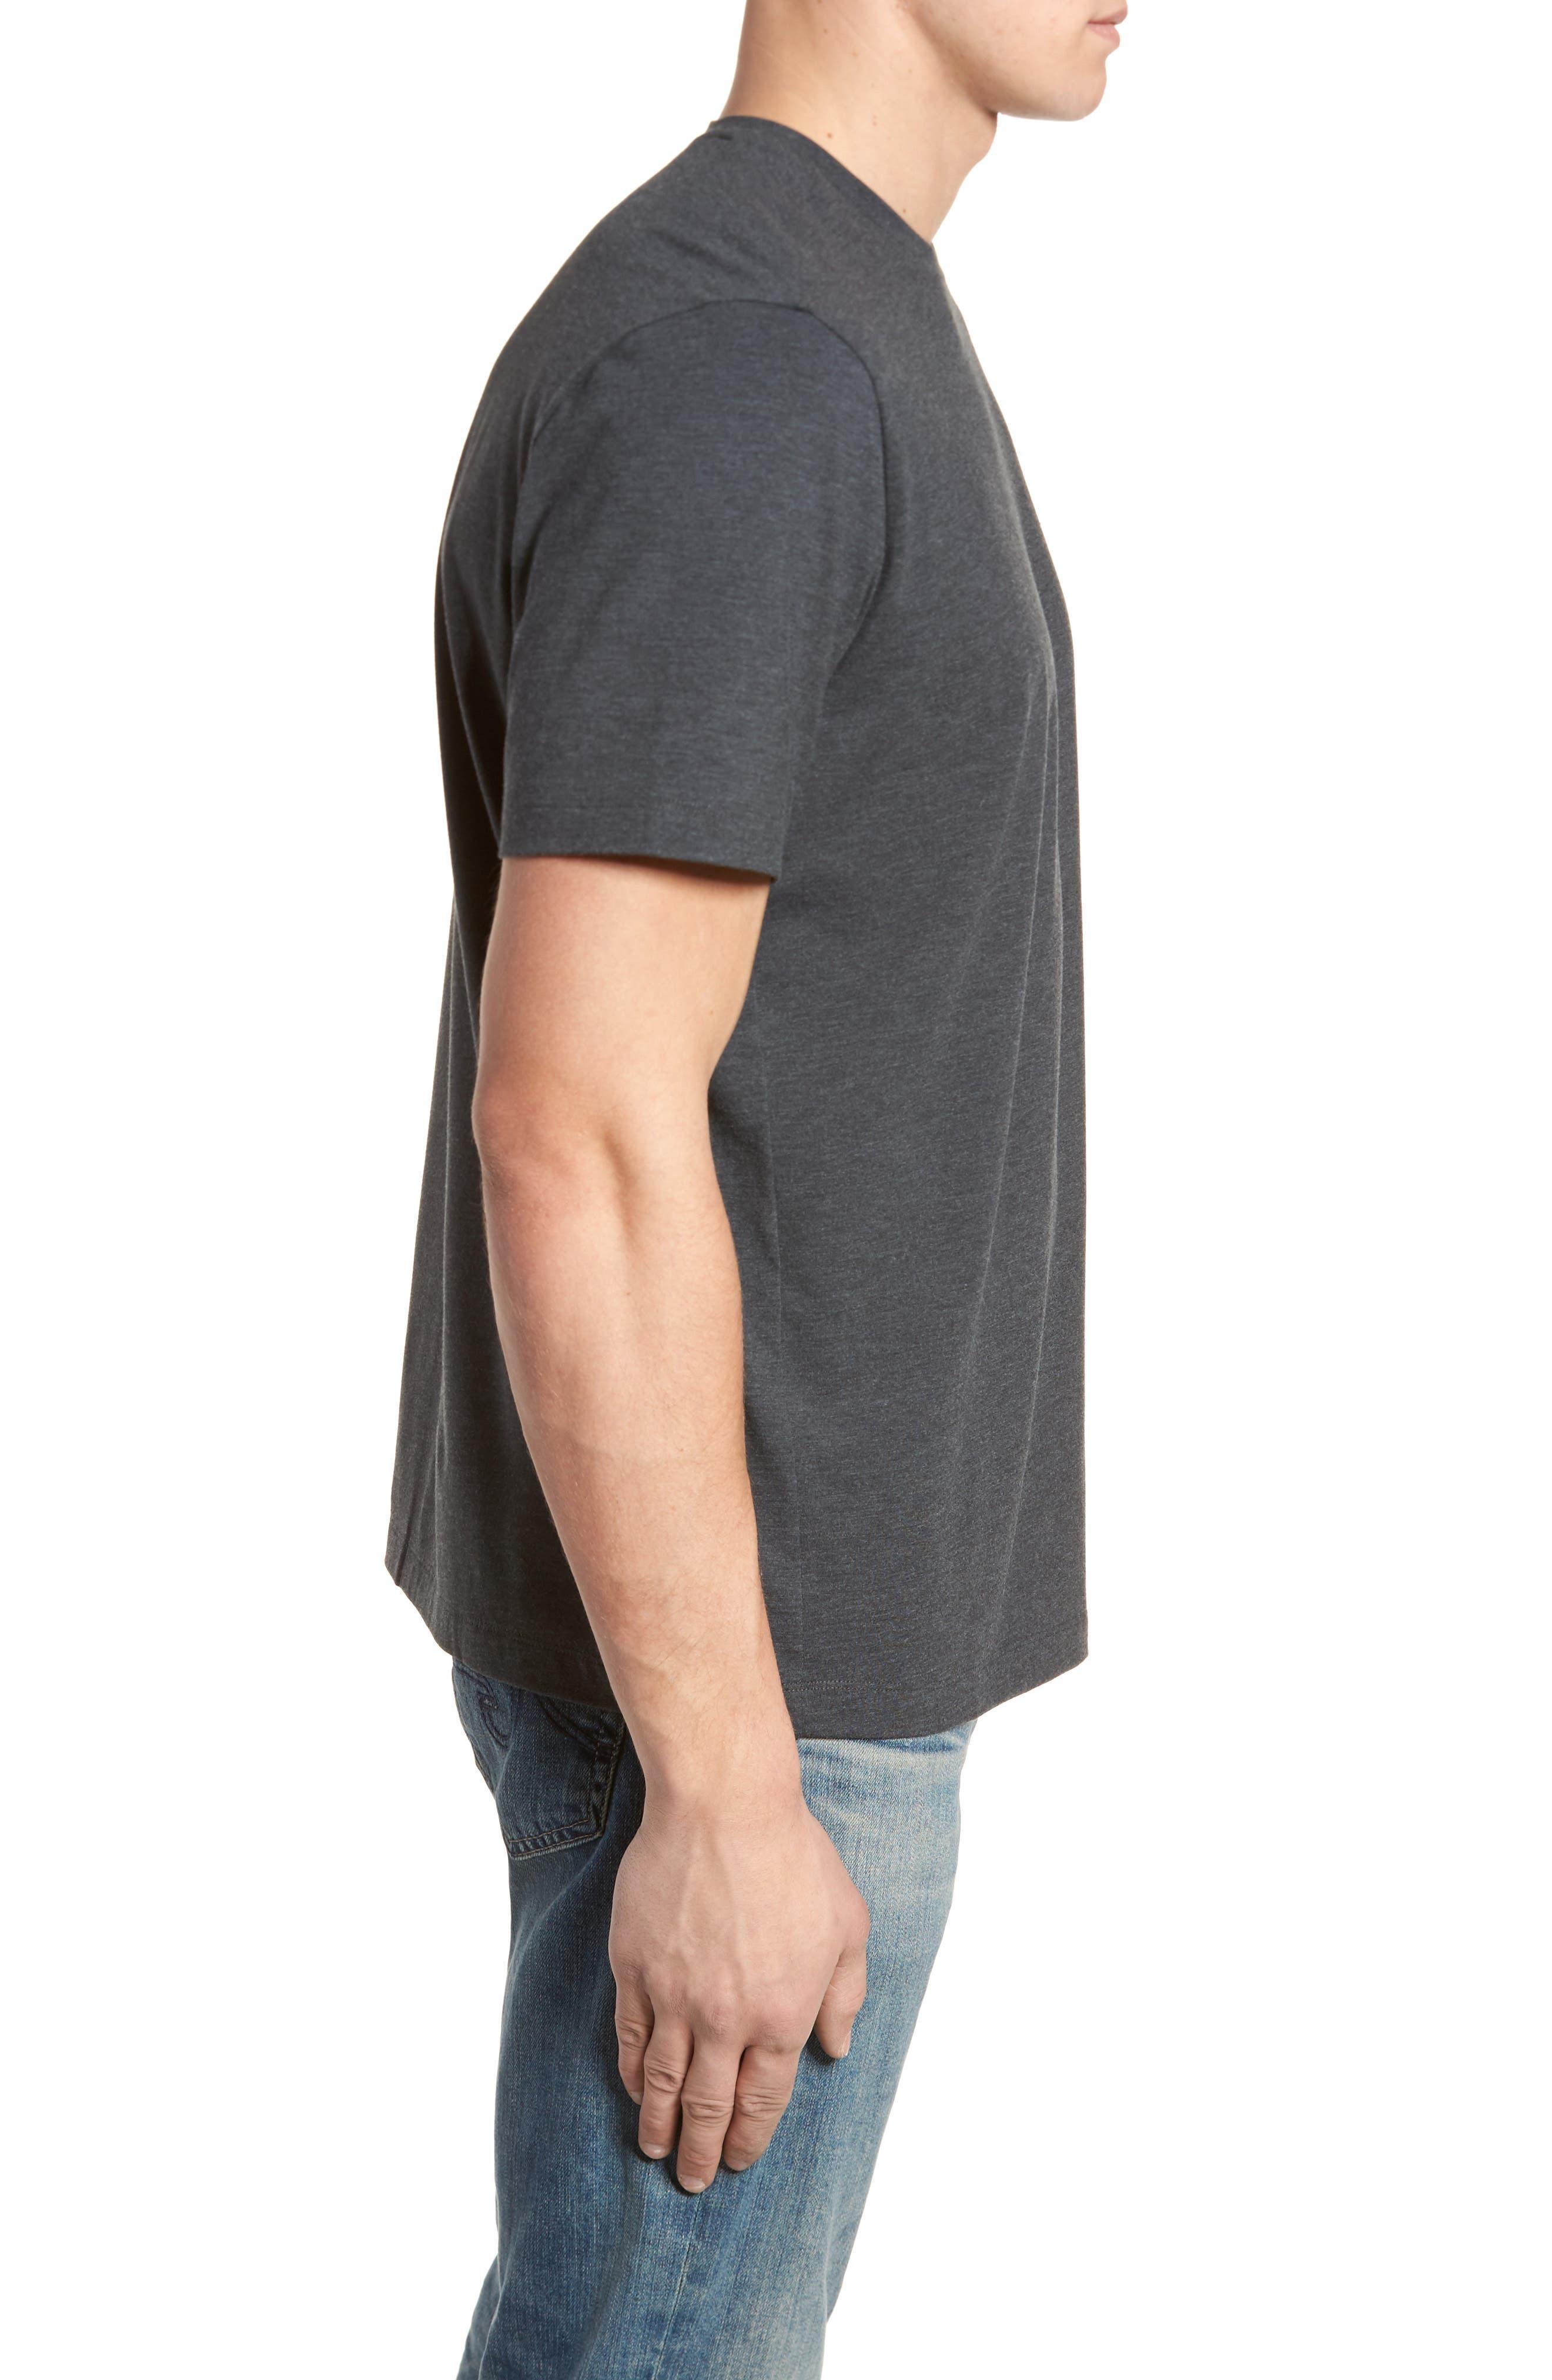 Tropicool T-Shirt,                             Alternate thumbnail 22, color,